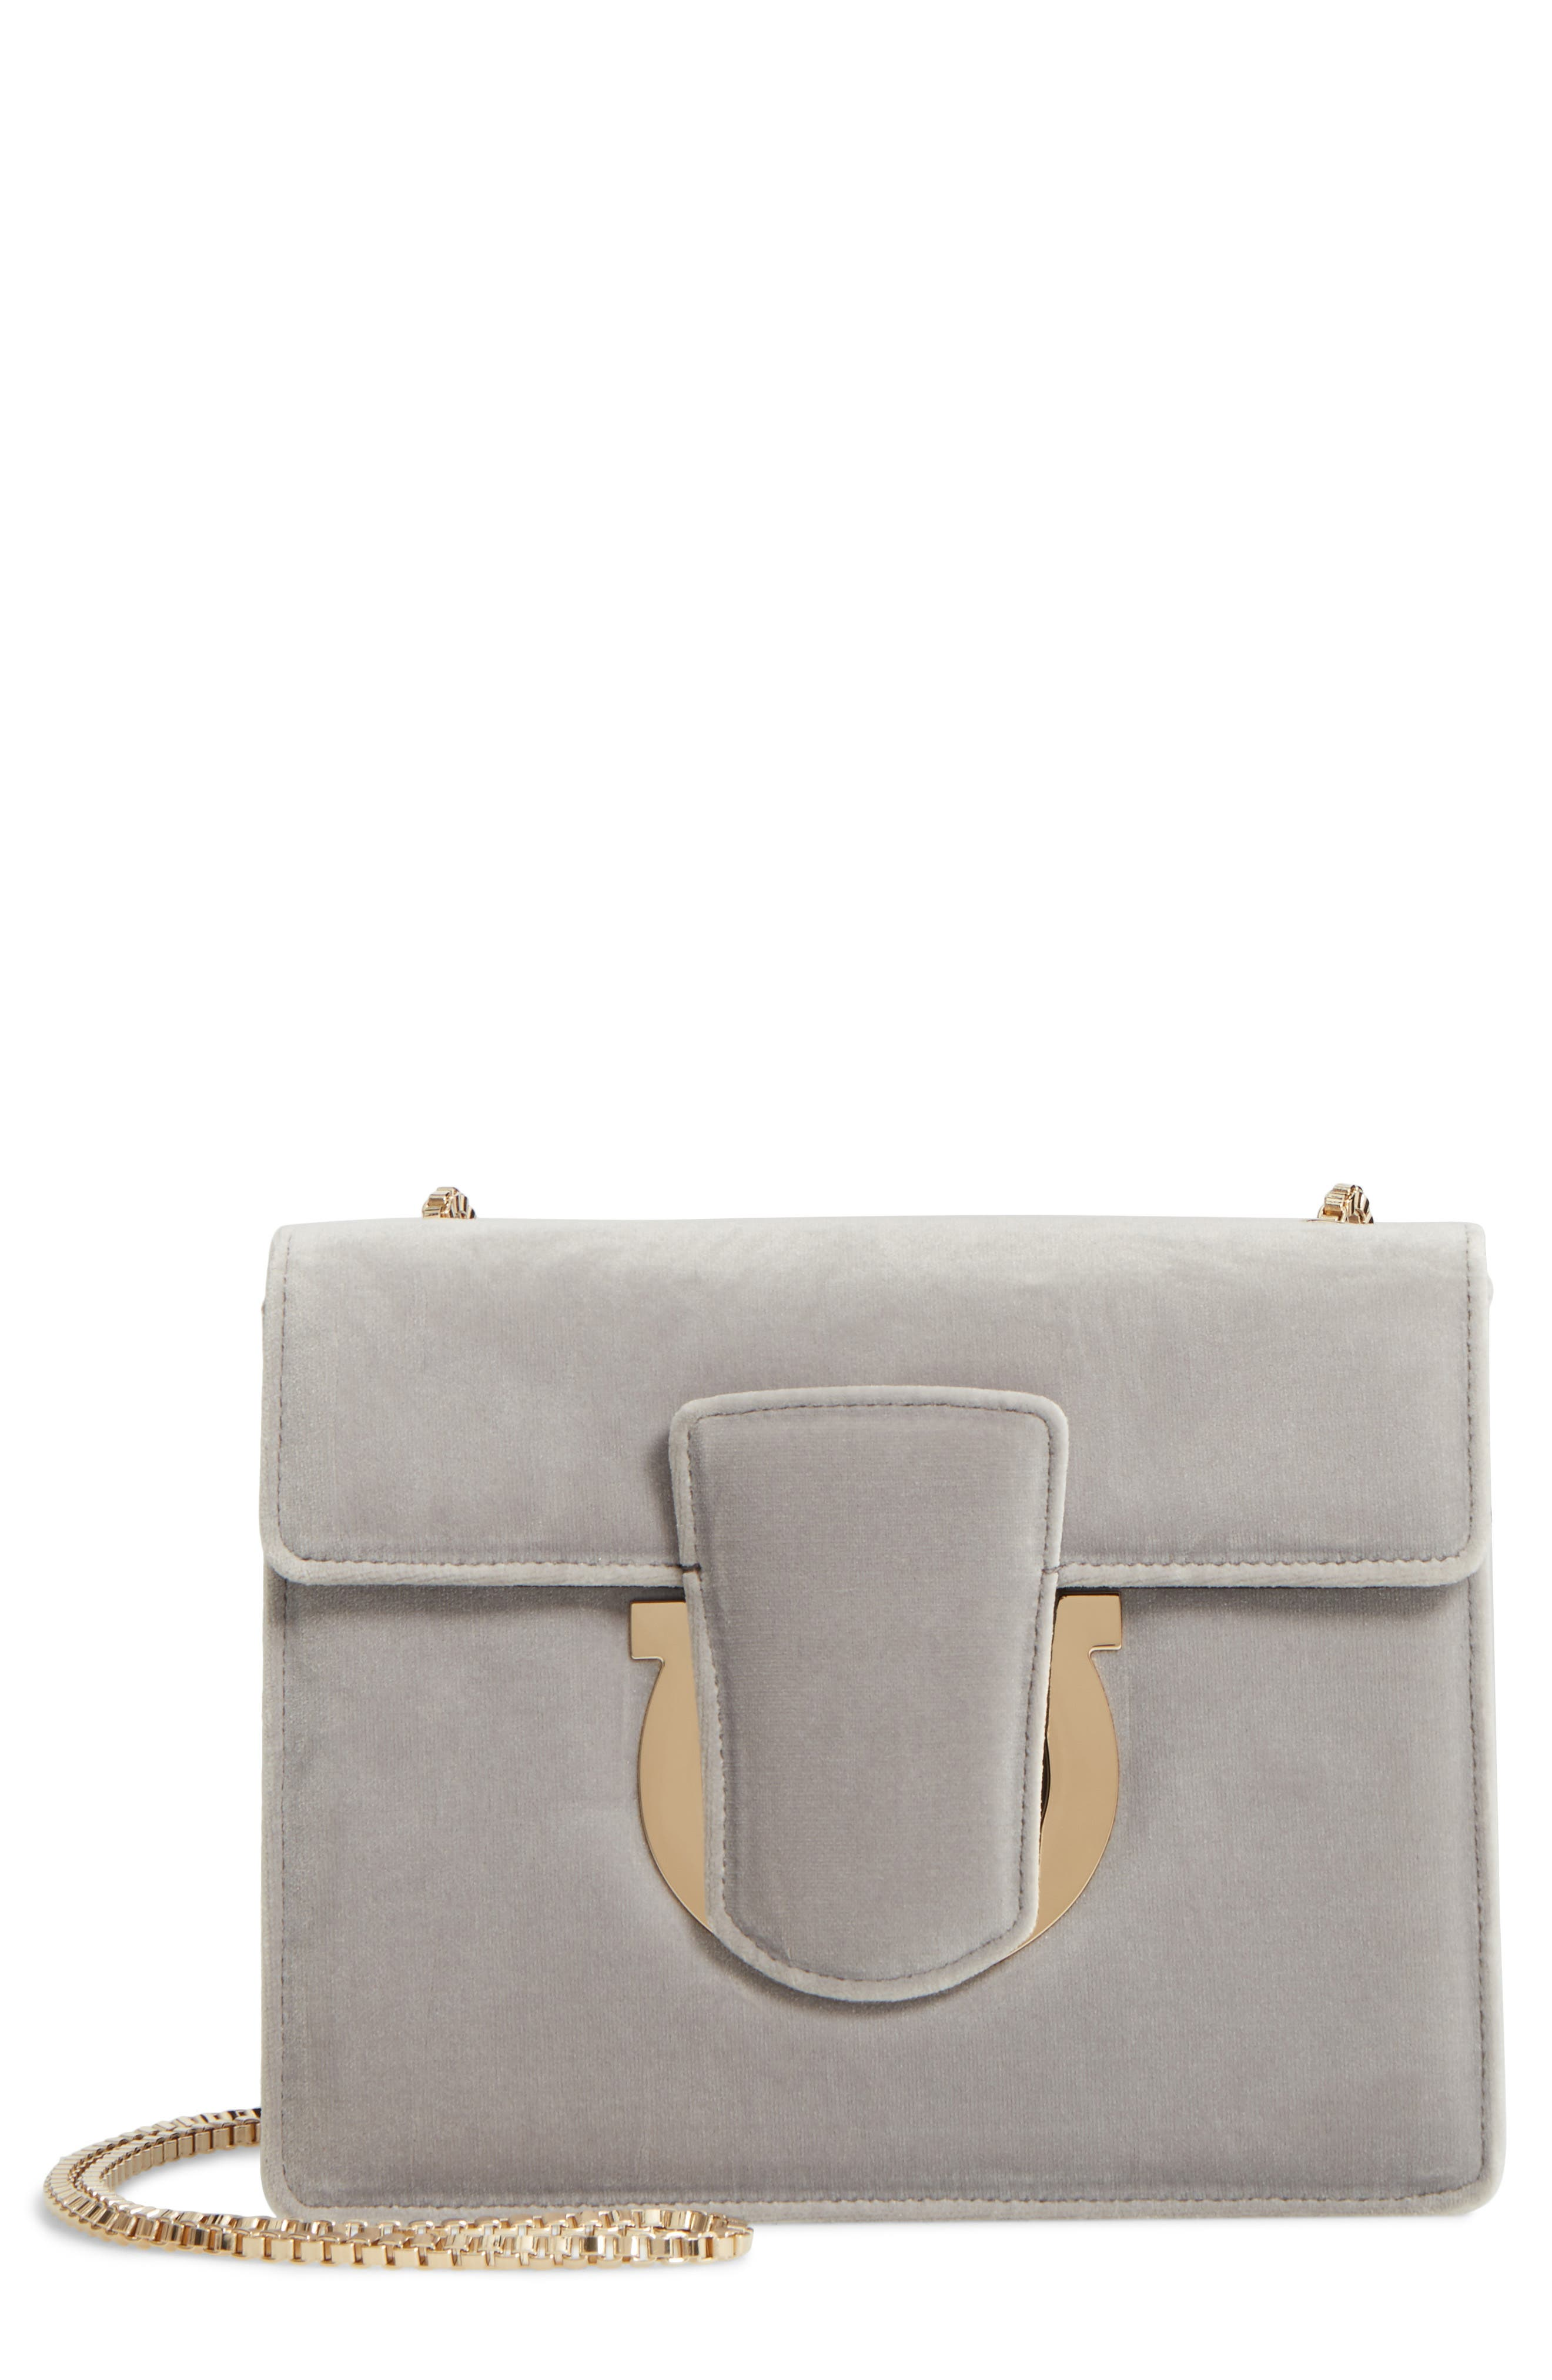 Alternate Image 1 Selected - Salvatore Ferragamo Small Thalia Velvet Crossbody Bag